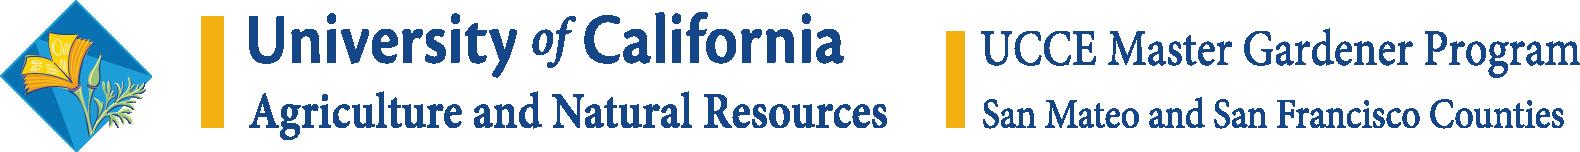 Cooperative Extension San Mateo & San Francisco Counties Survey Header Image